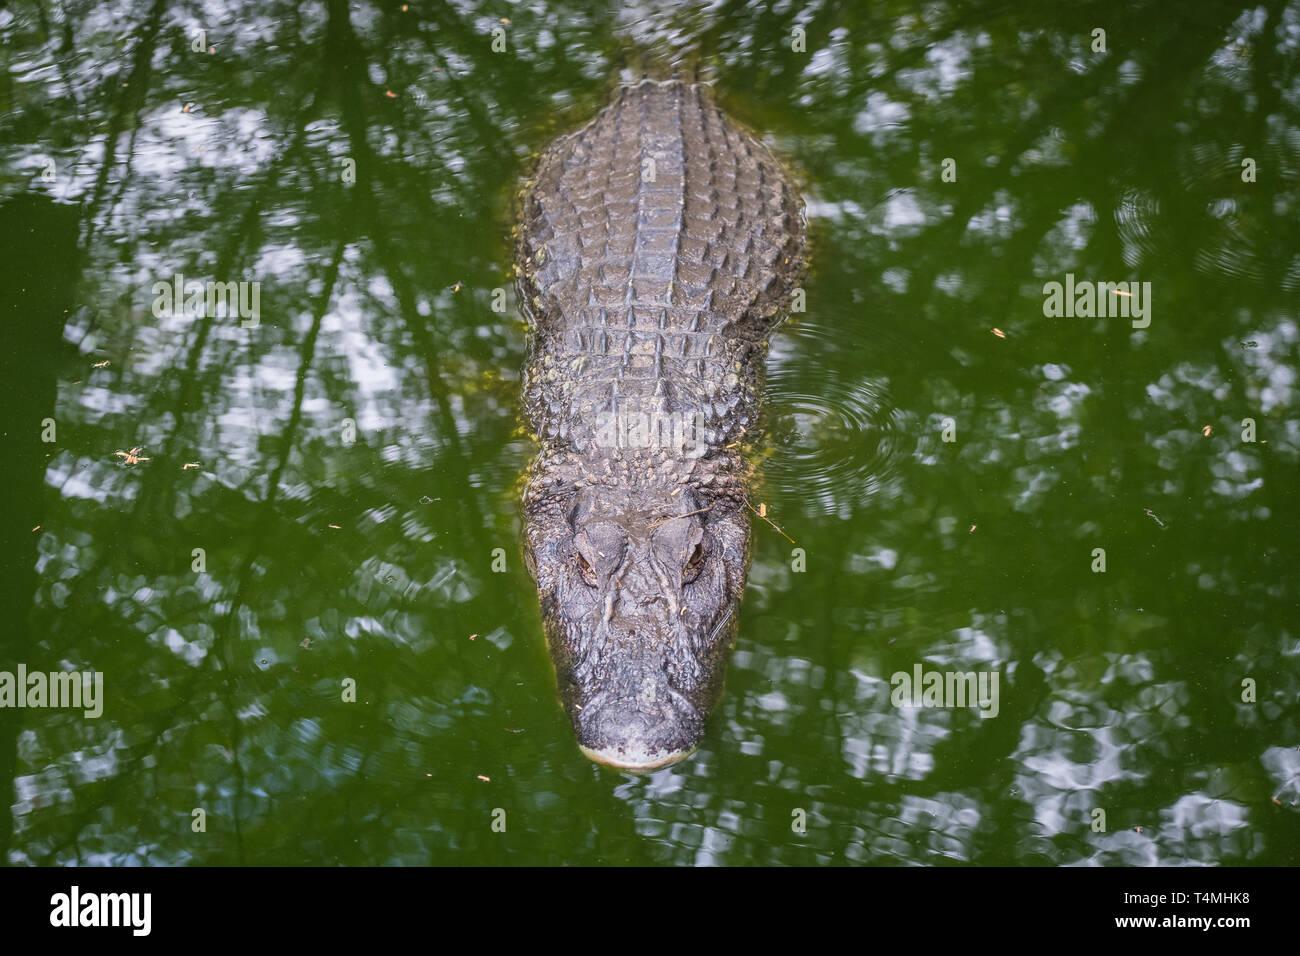 Caiman in a zoo, Guyana, Cayenne, France - Stock Image